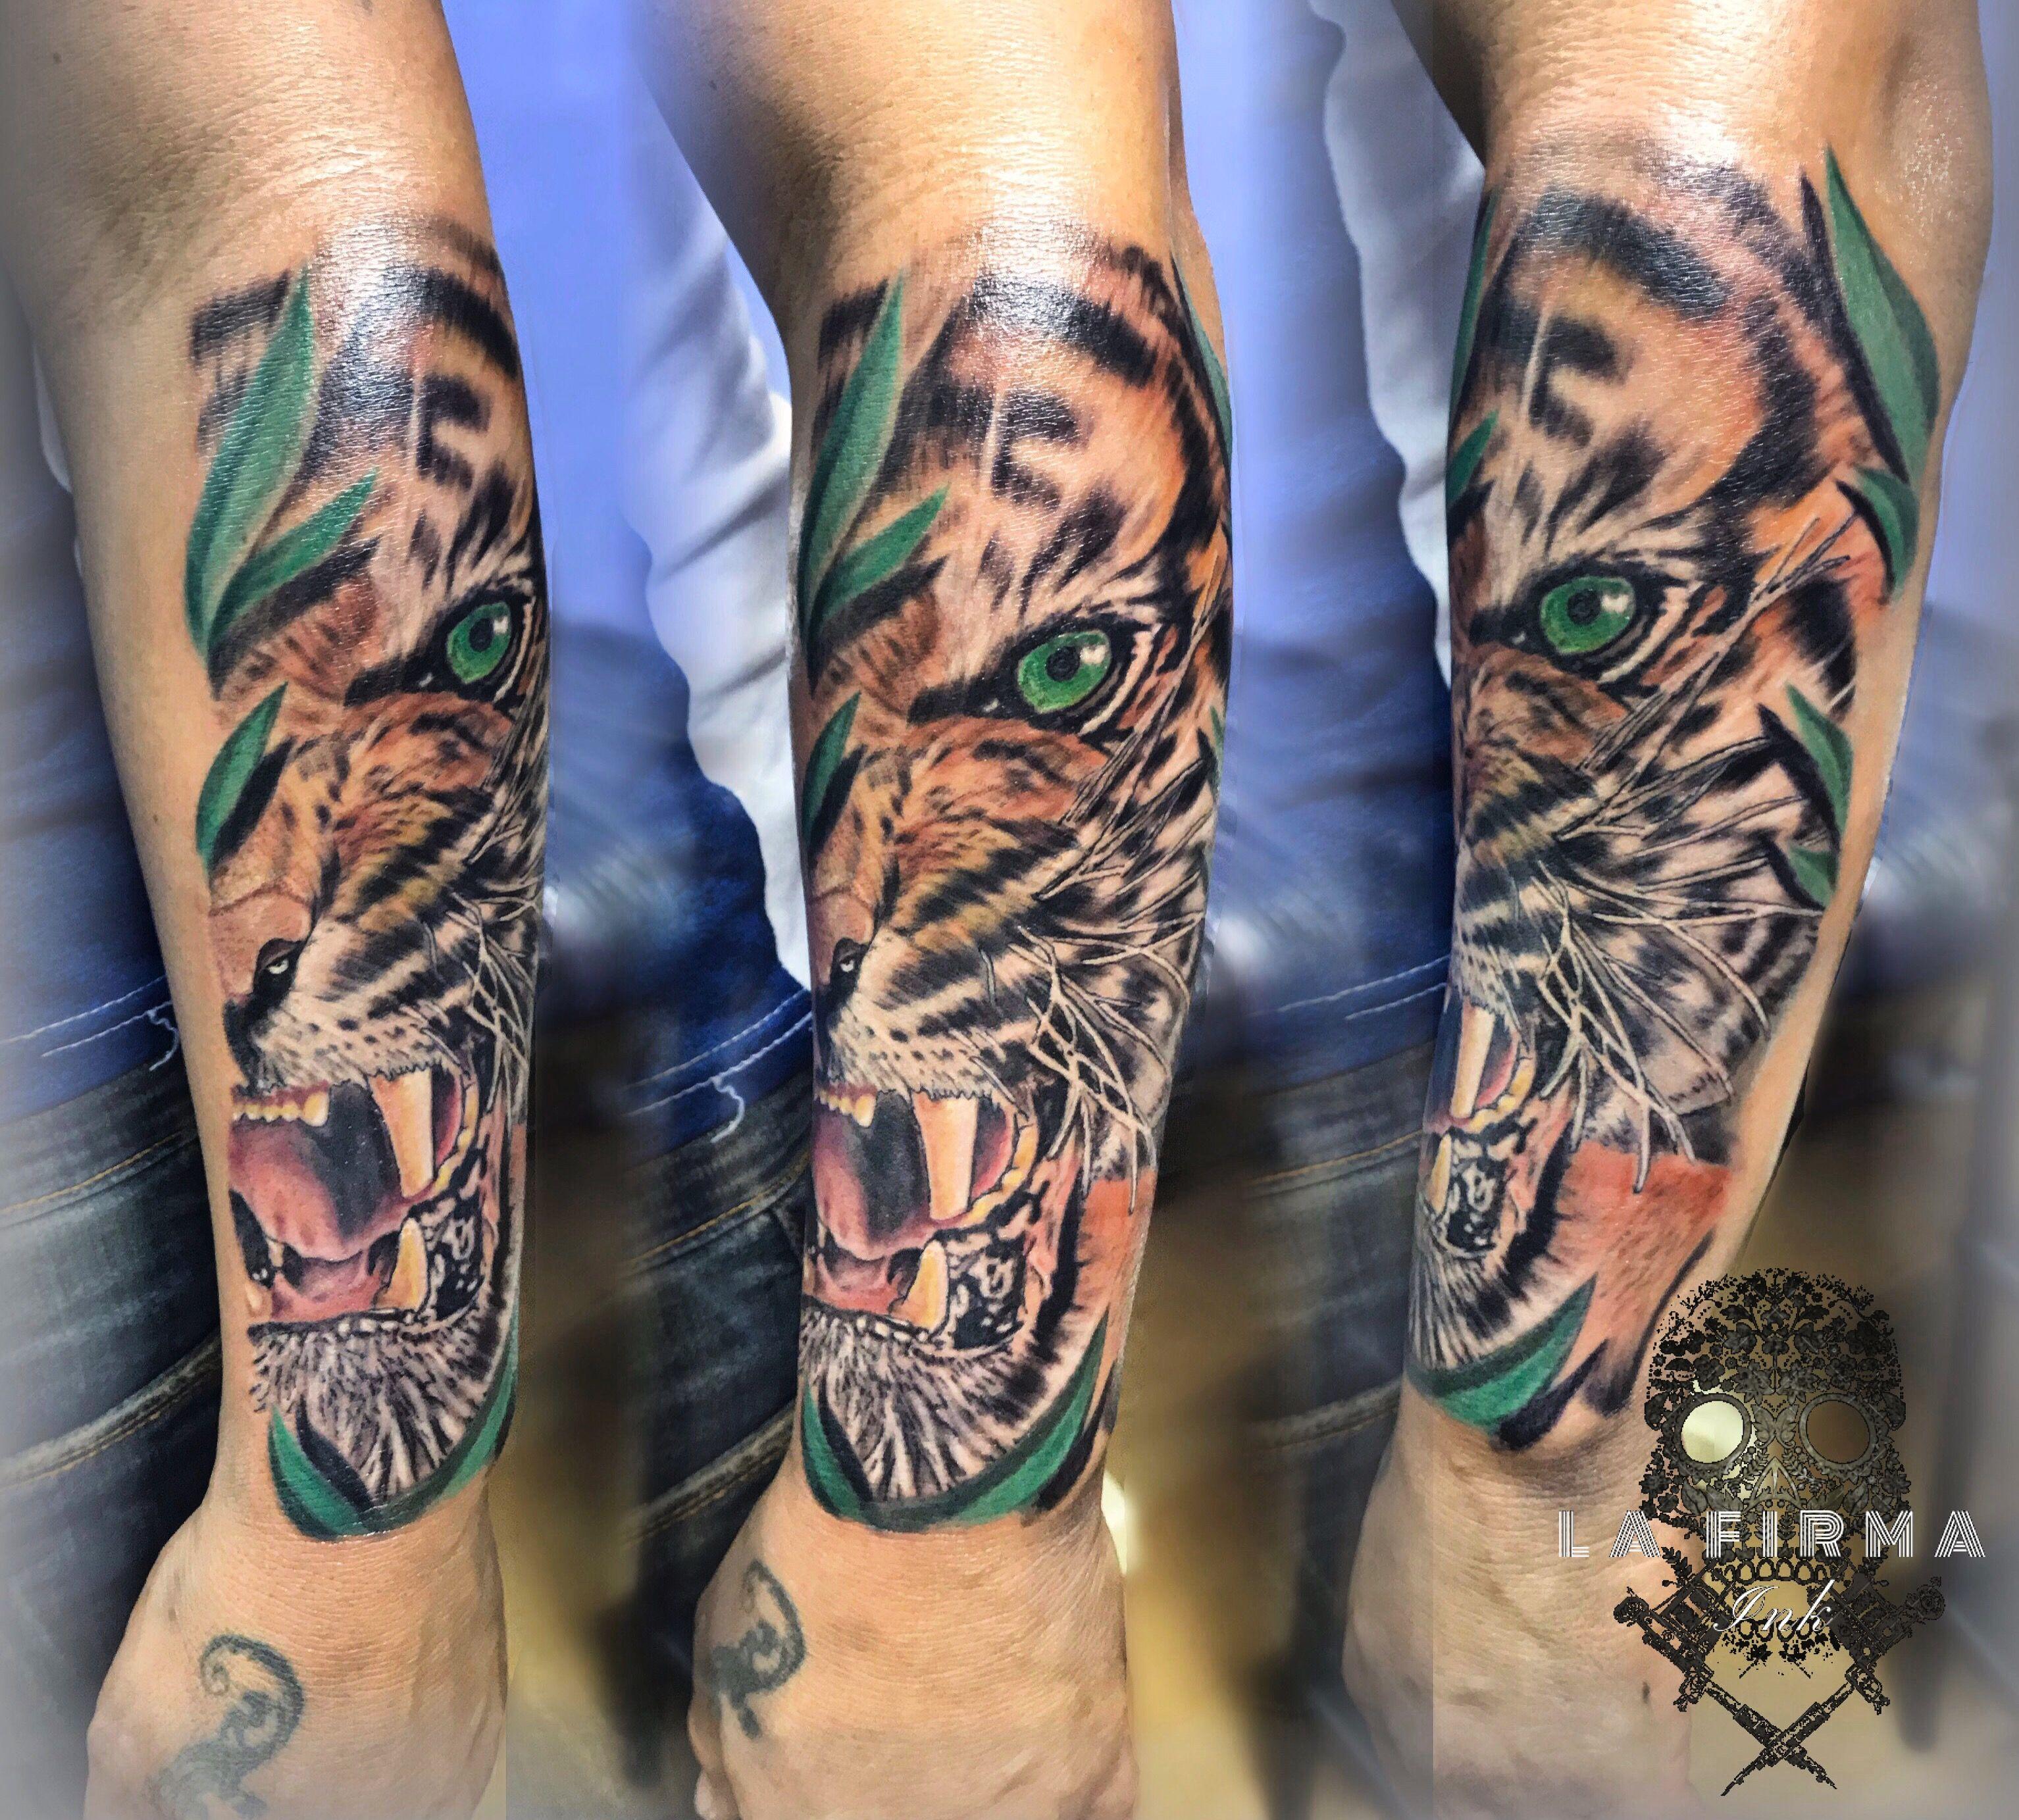 Tigre tattoo fullcolor Tattoos